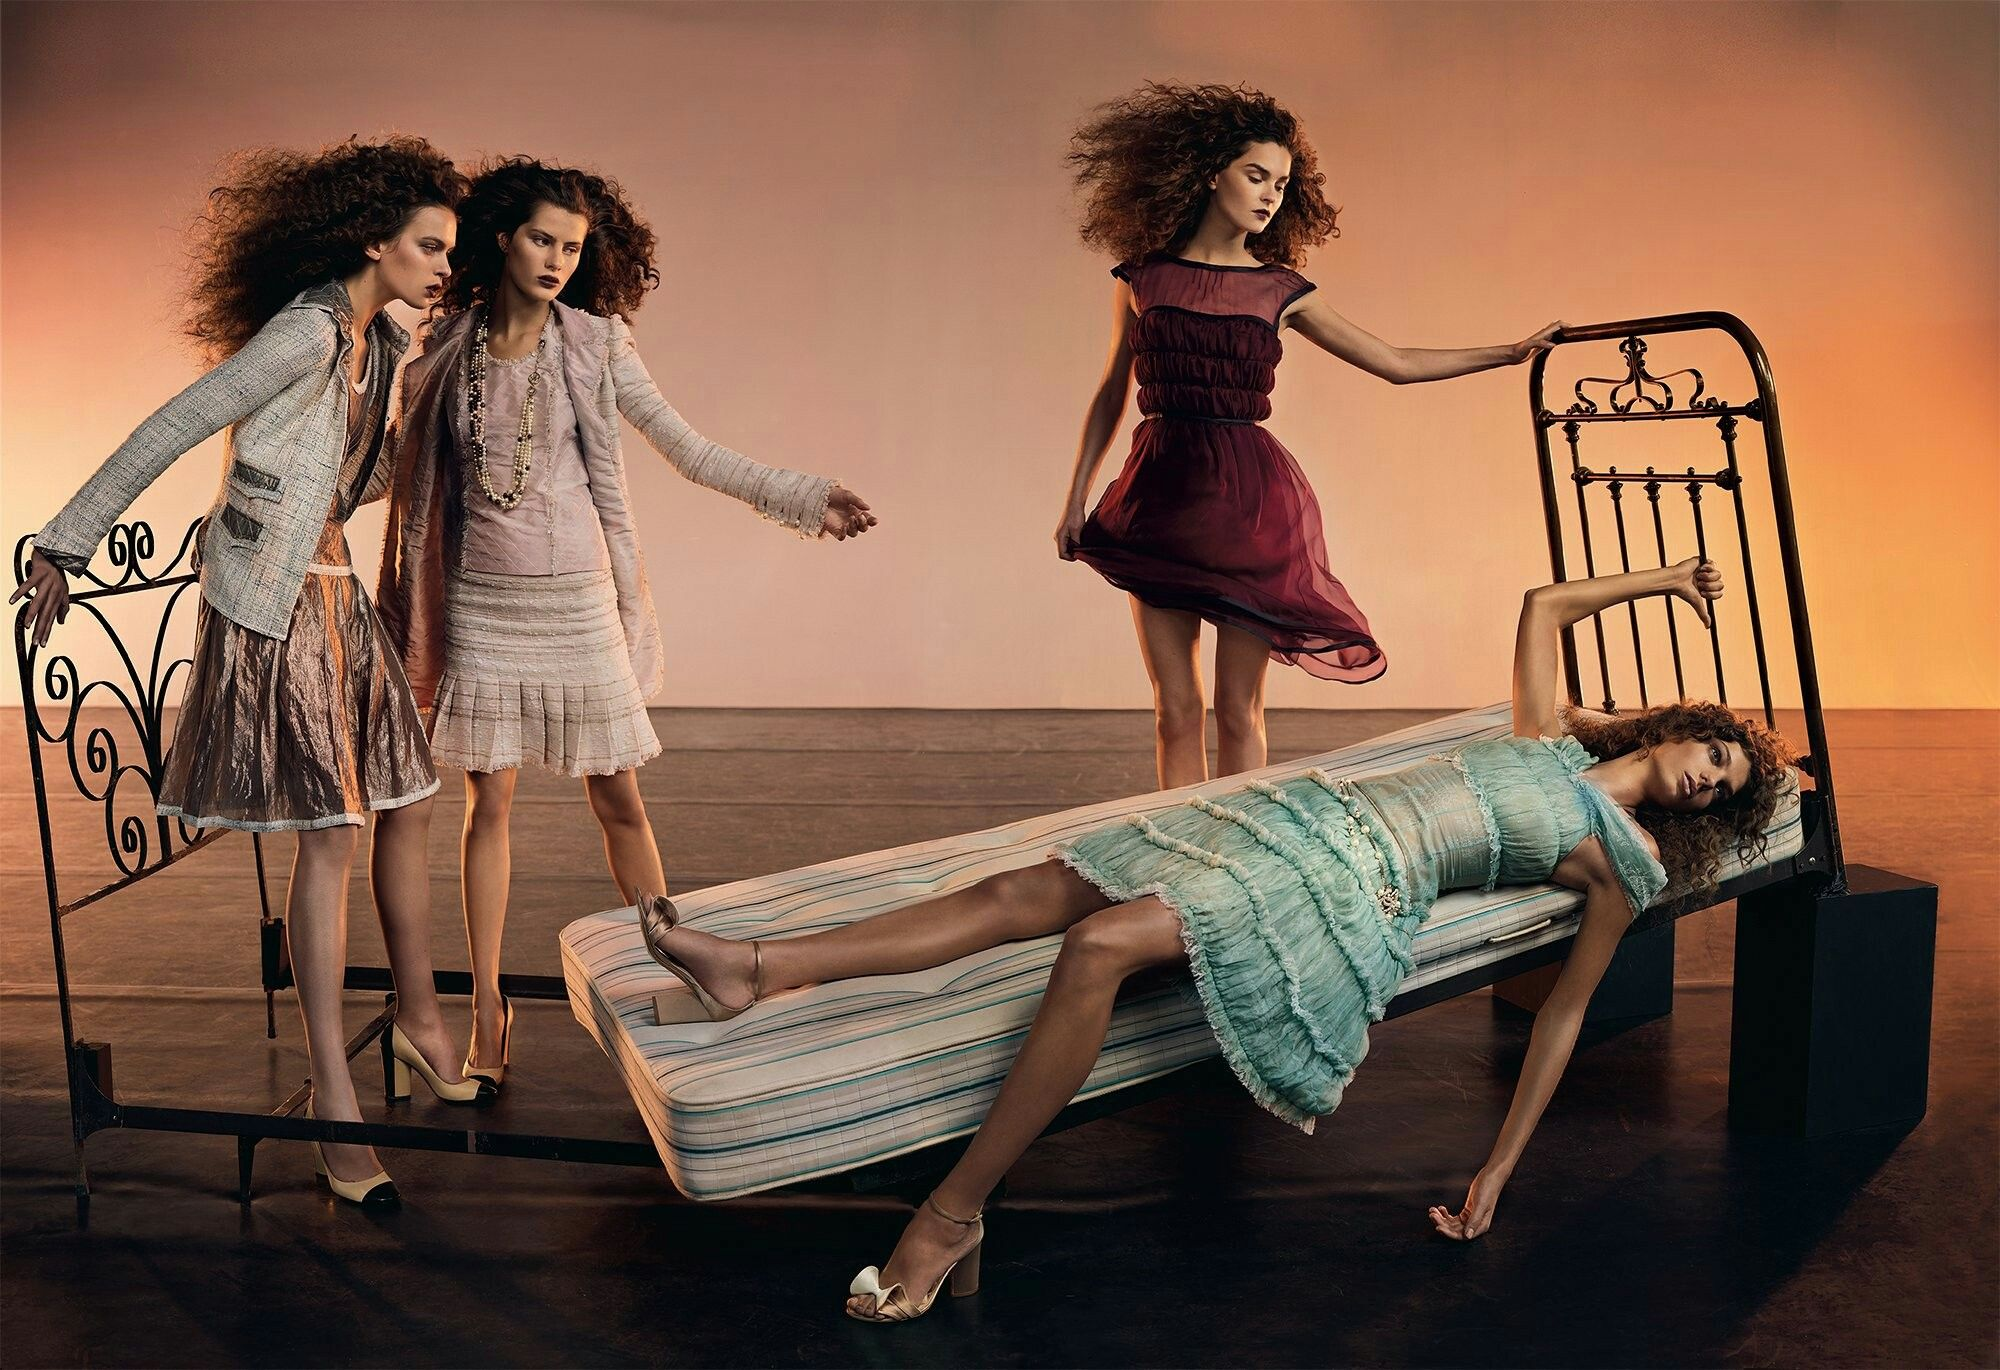 Sisterhood Editorial fashion, Karen elson, Fashion